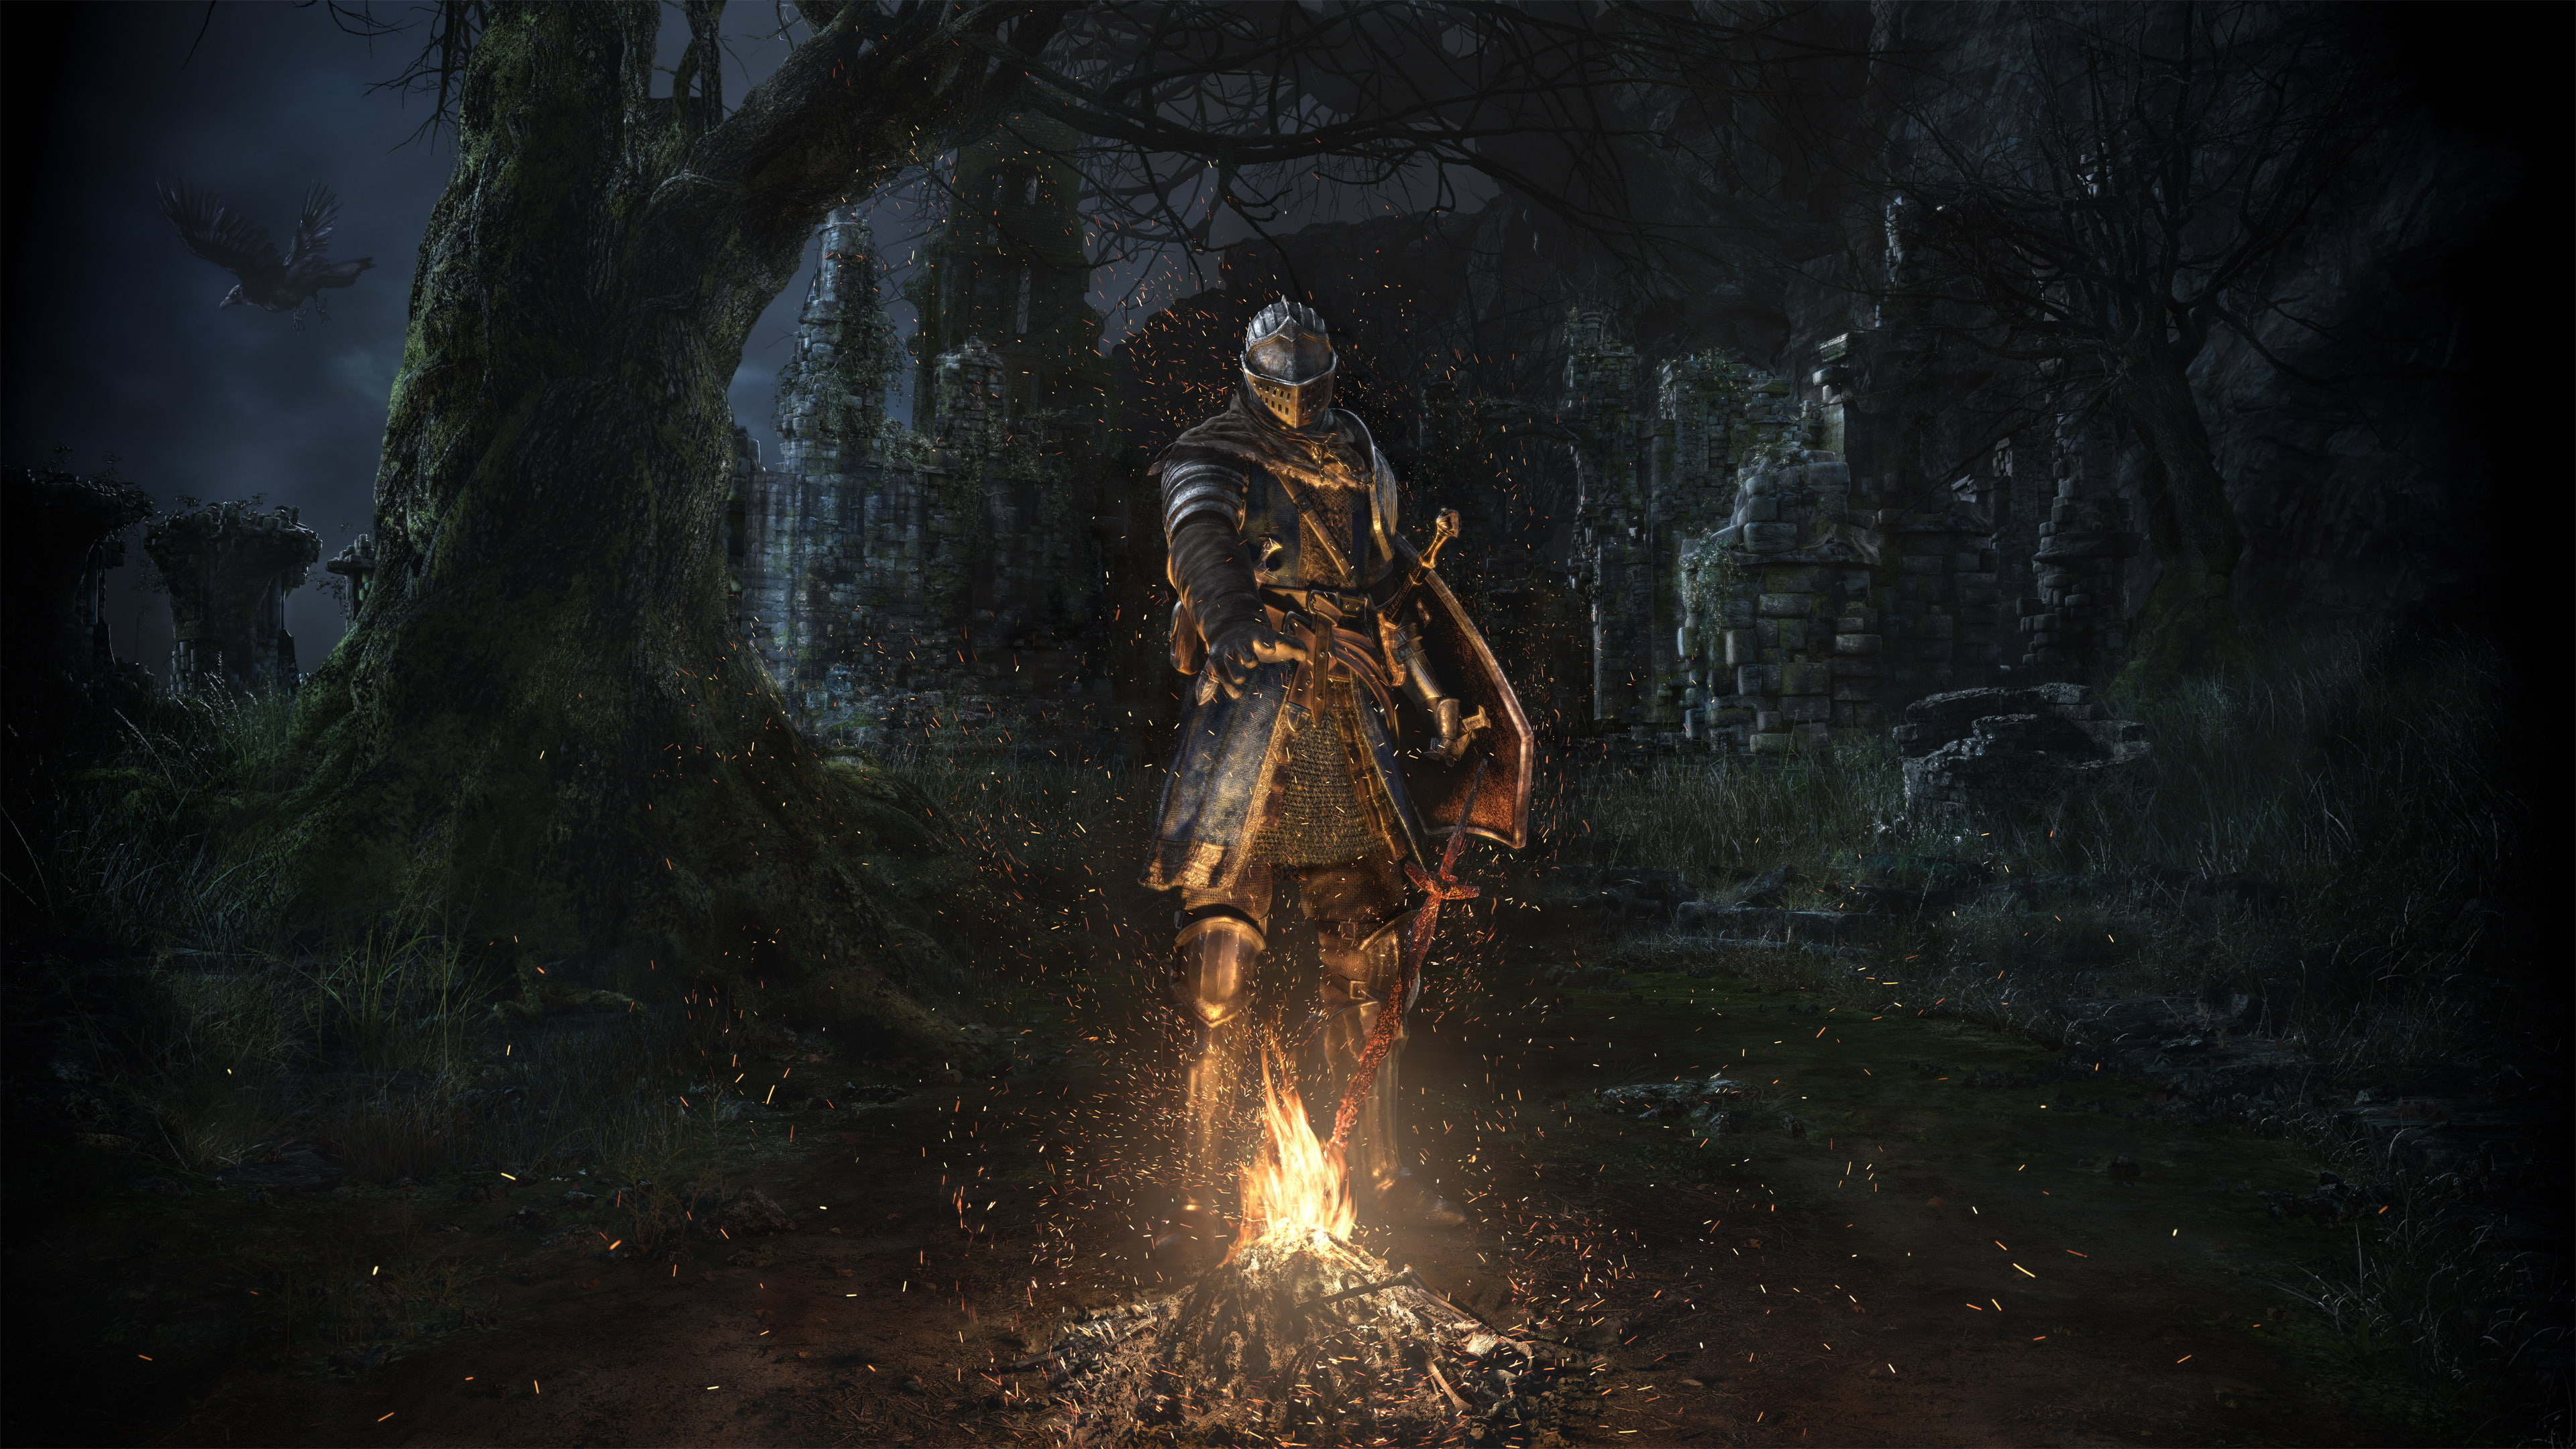 10. Dark Souls